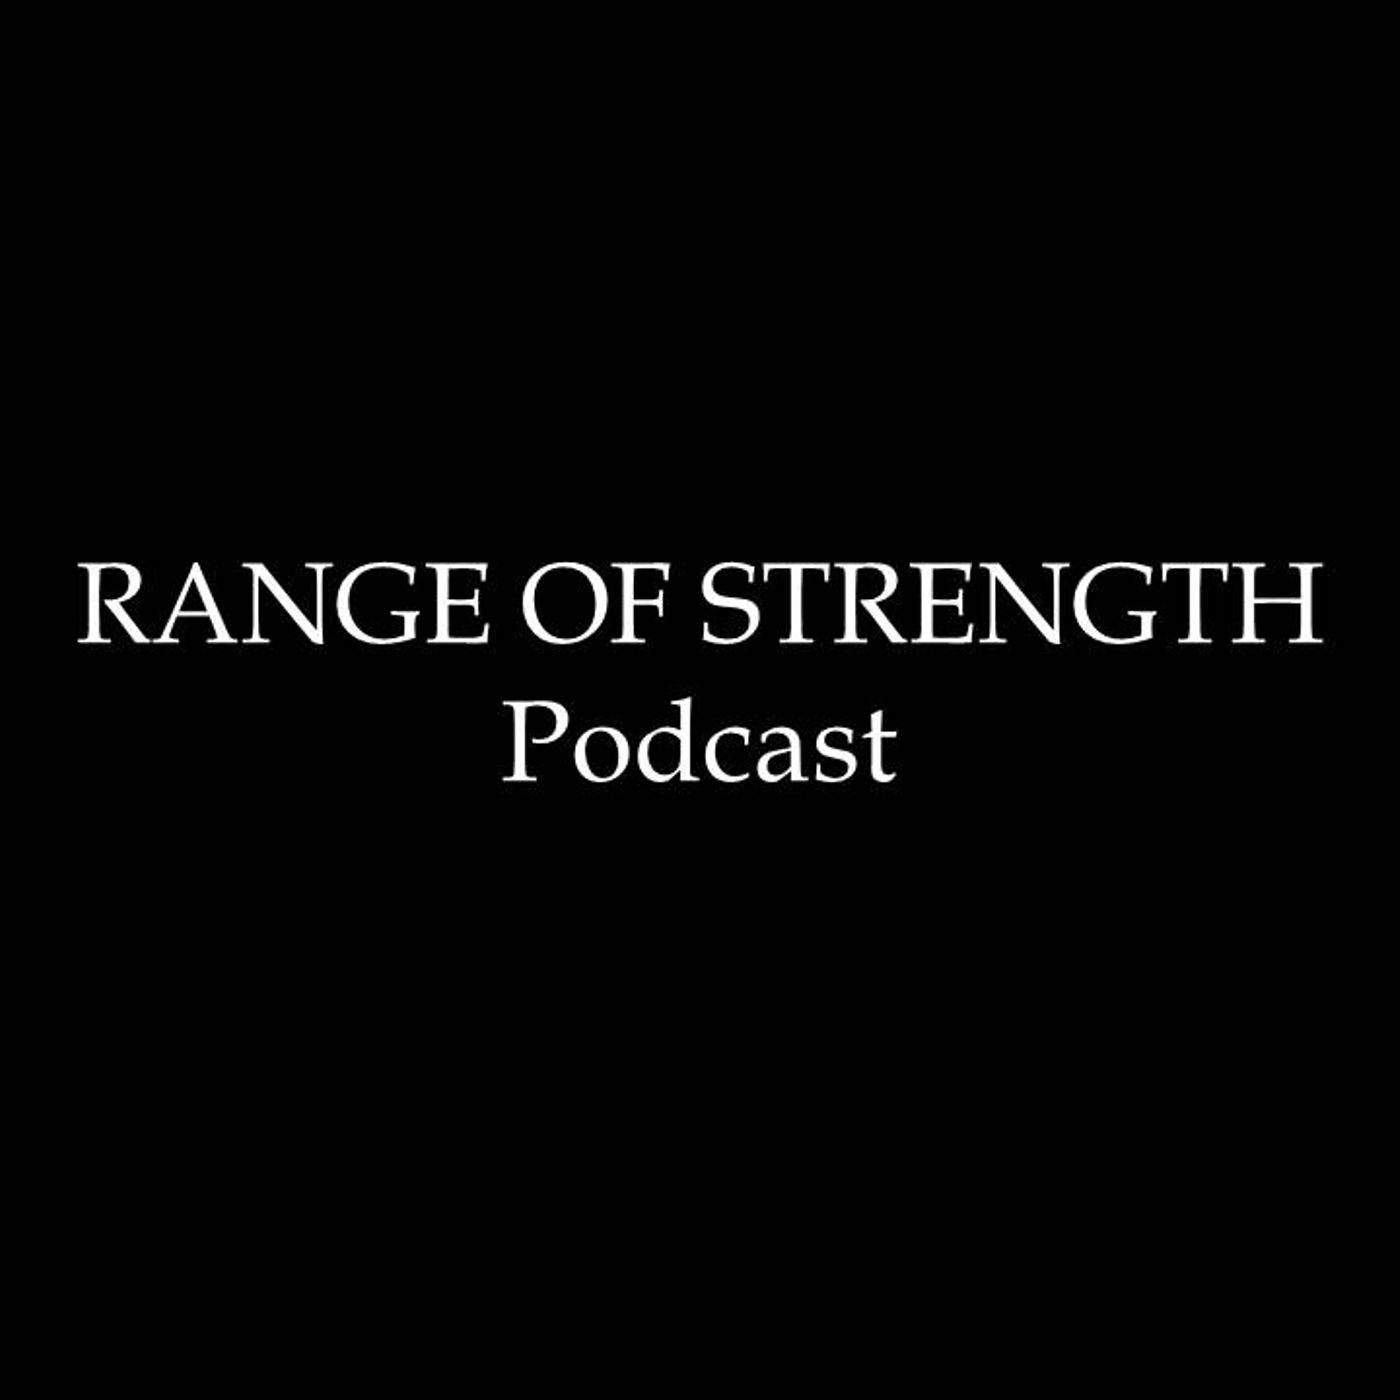 RANGE OF STRENGTH Podcast Episode 20: Oldtime Strength with James Fuller